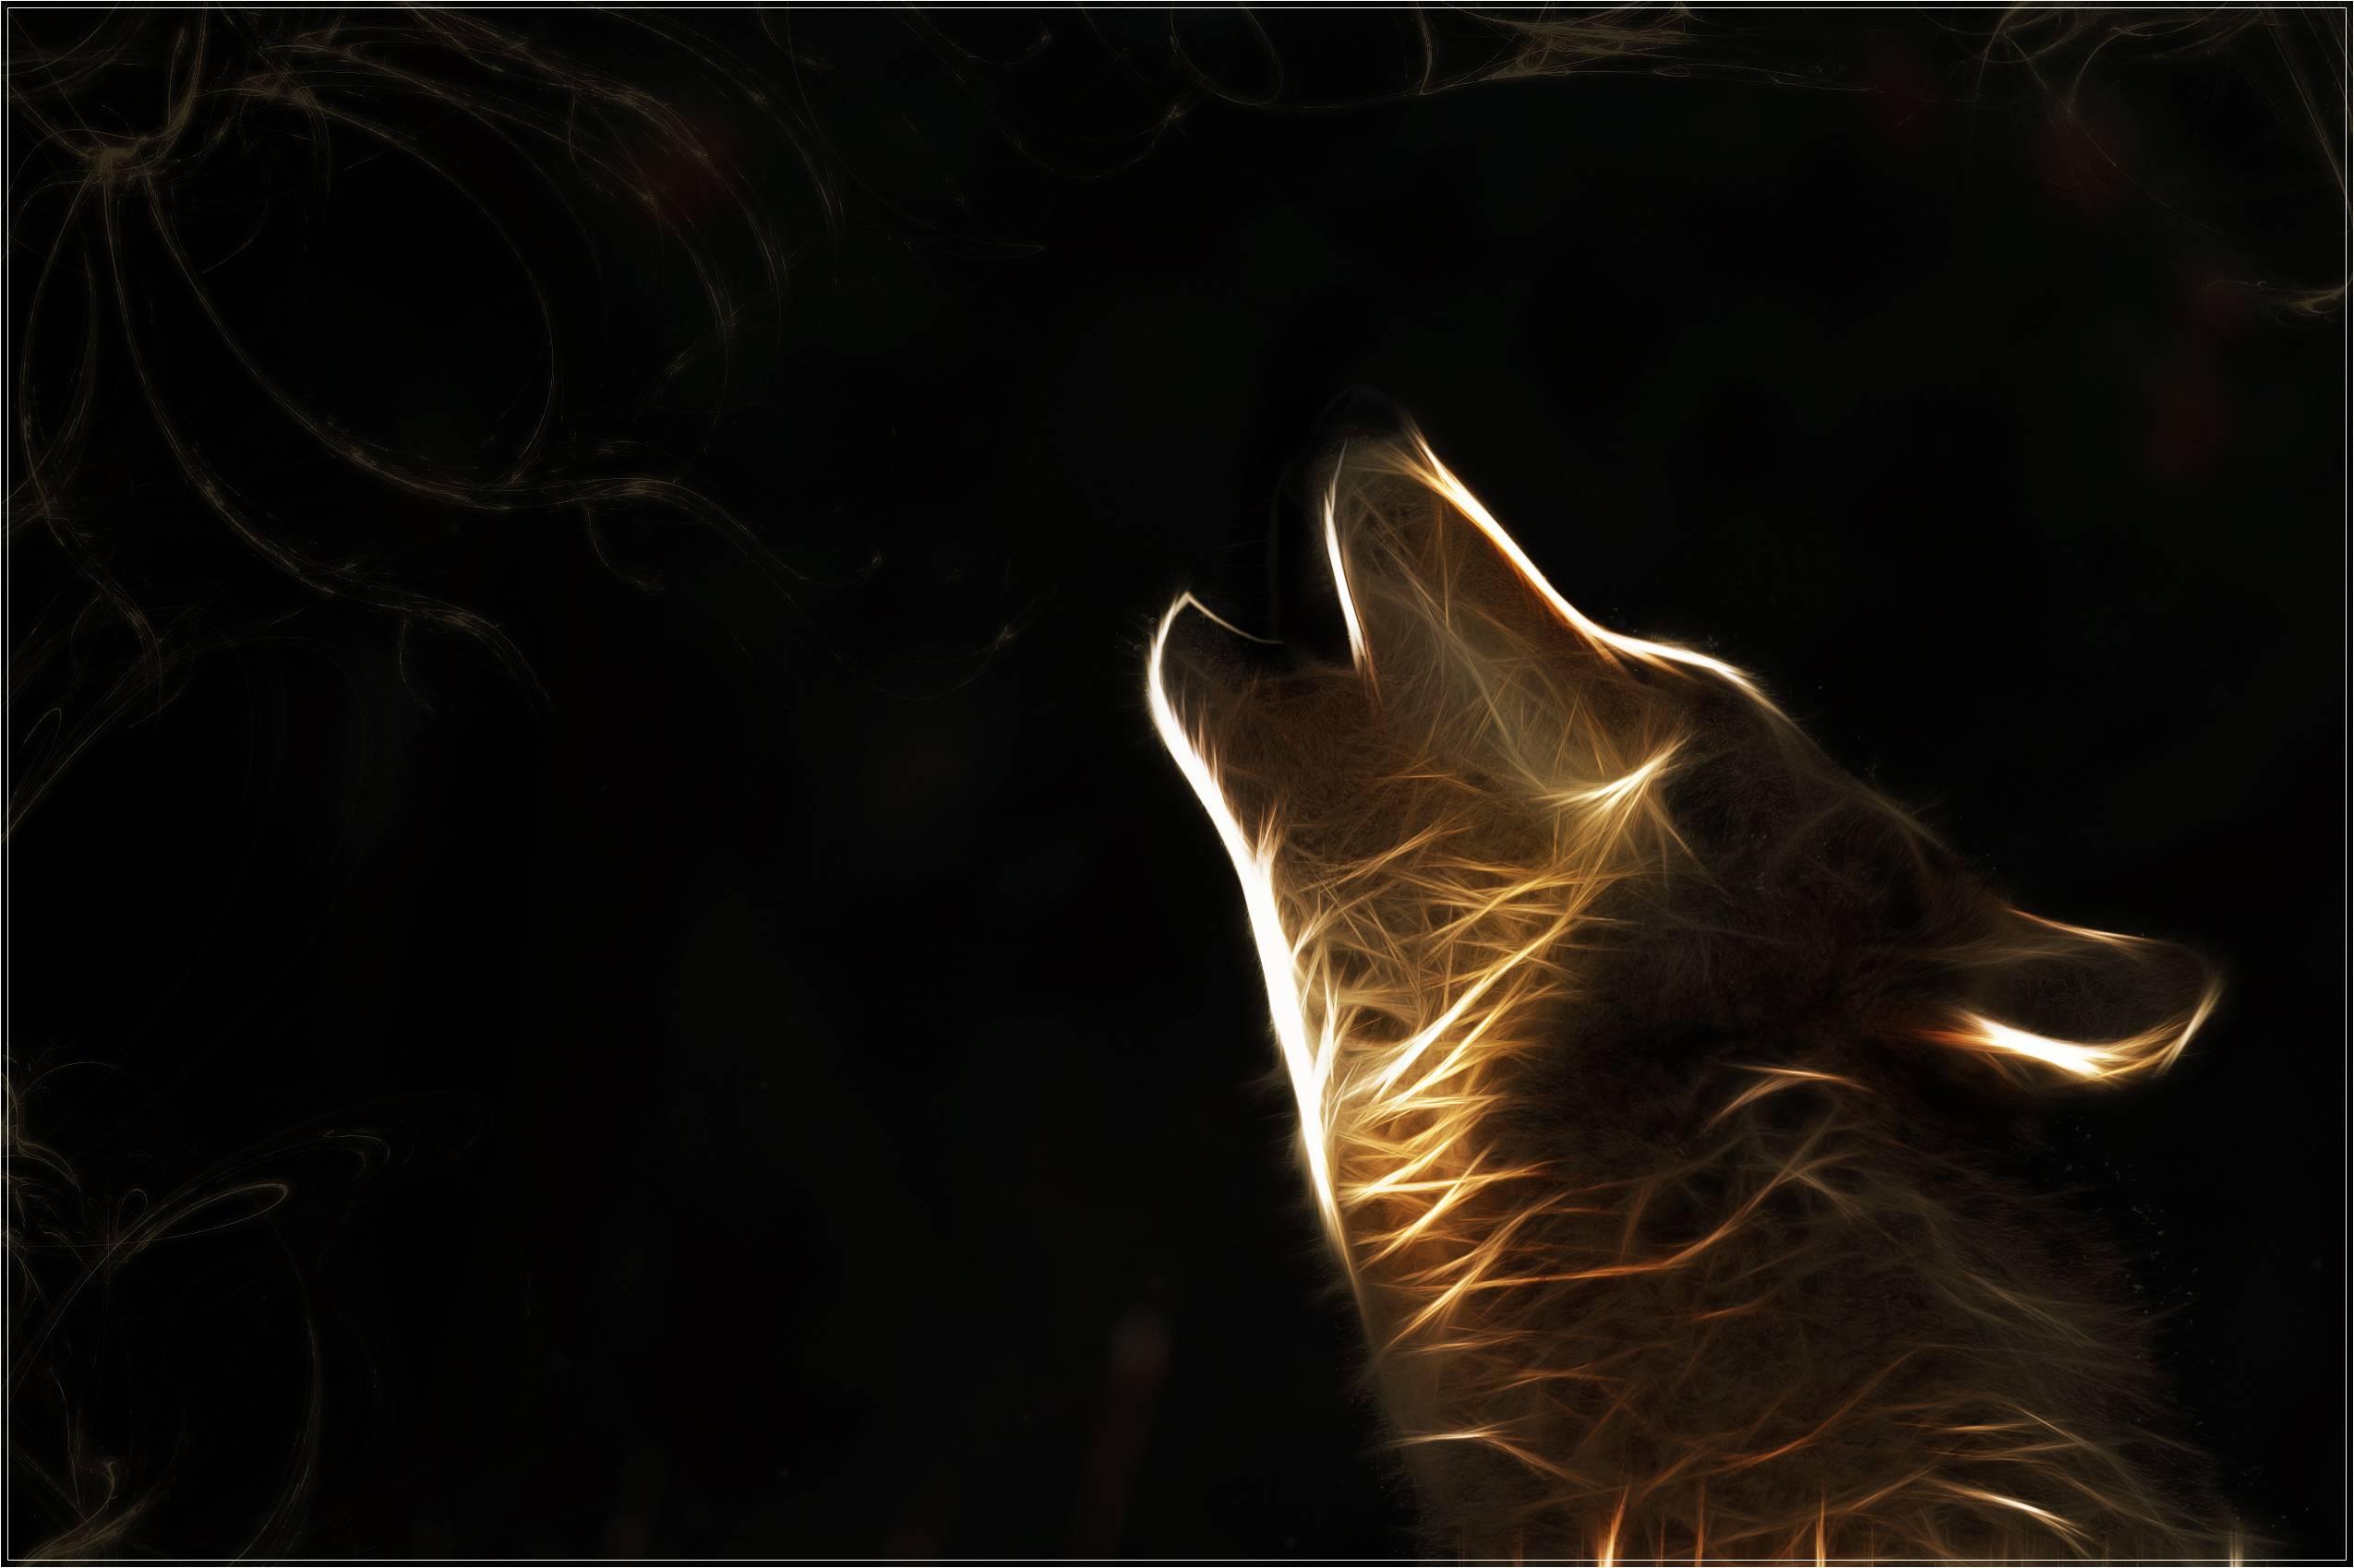 Hd wallpaper wolf - Wolf Hd Wallpapers